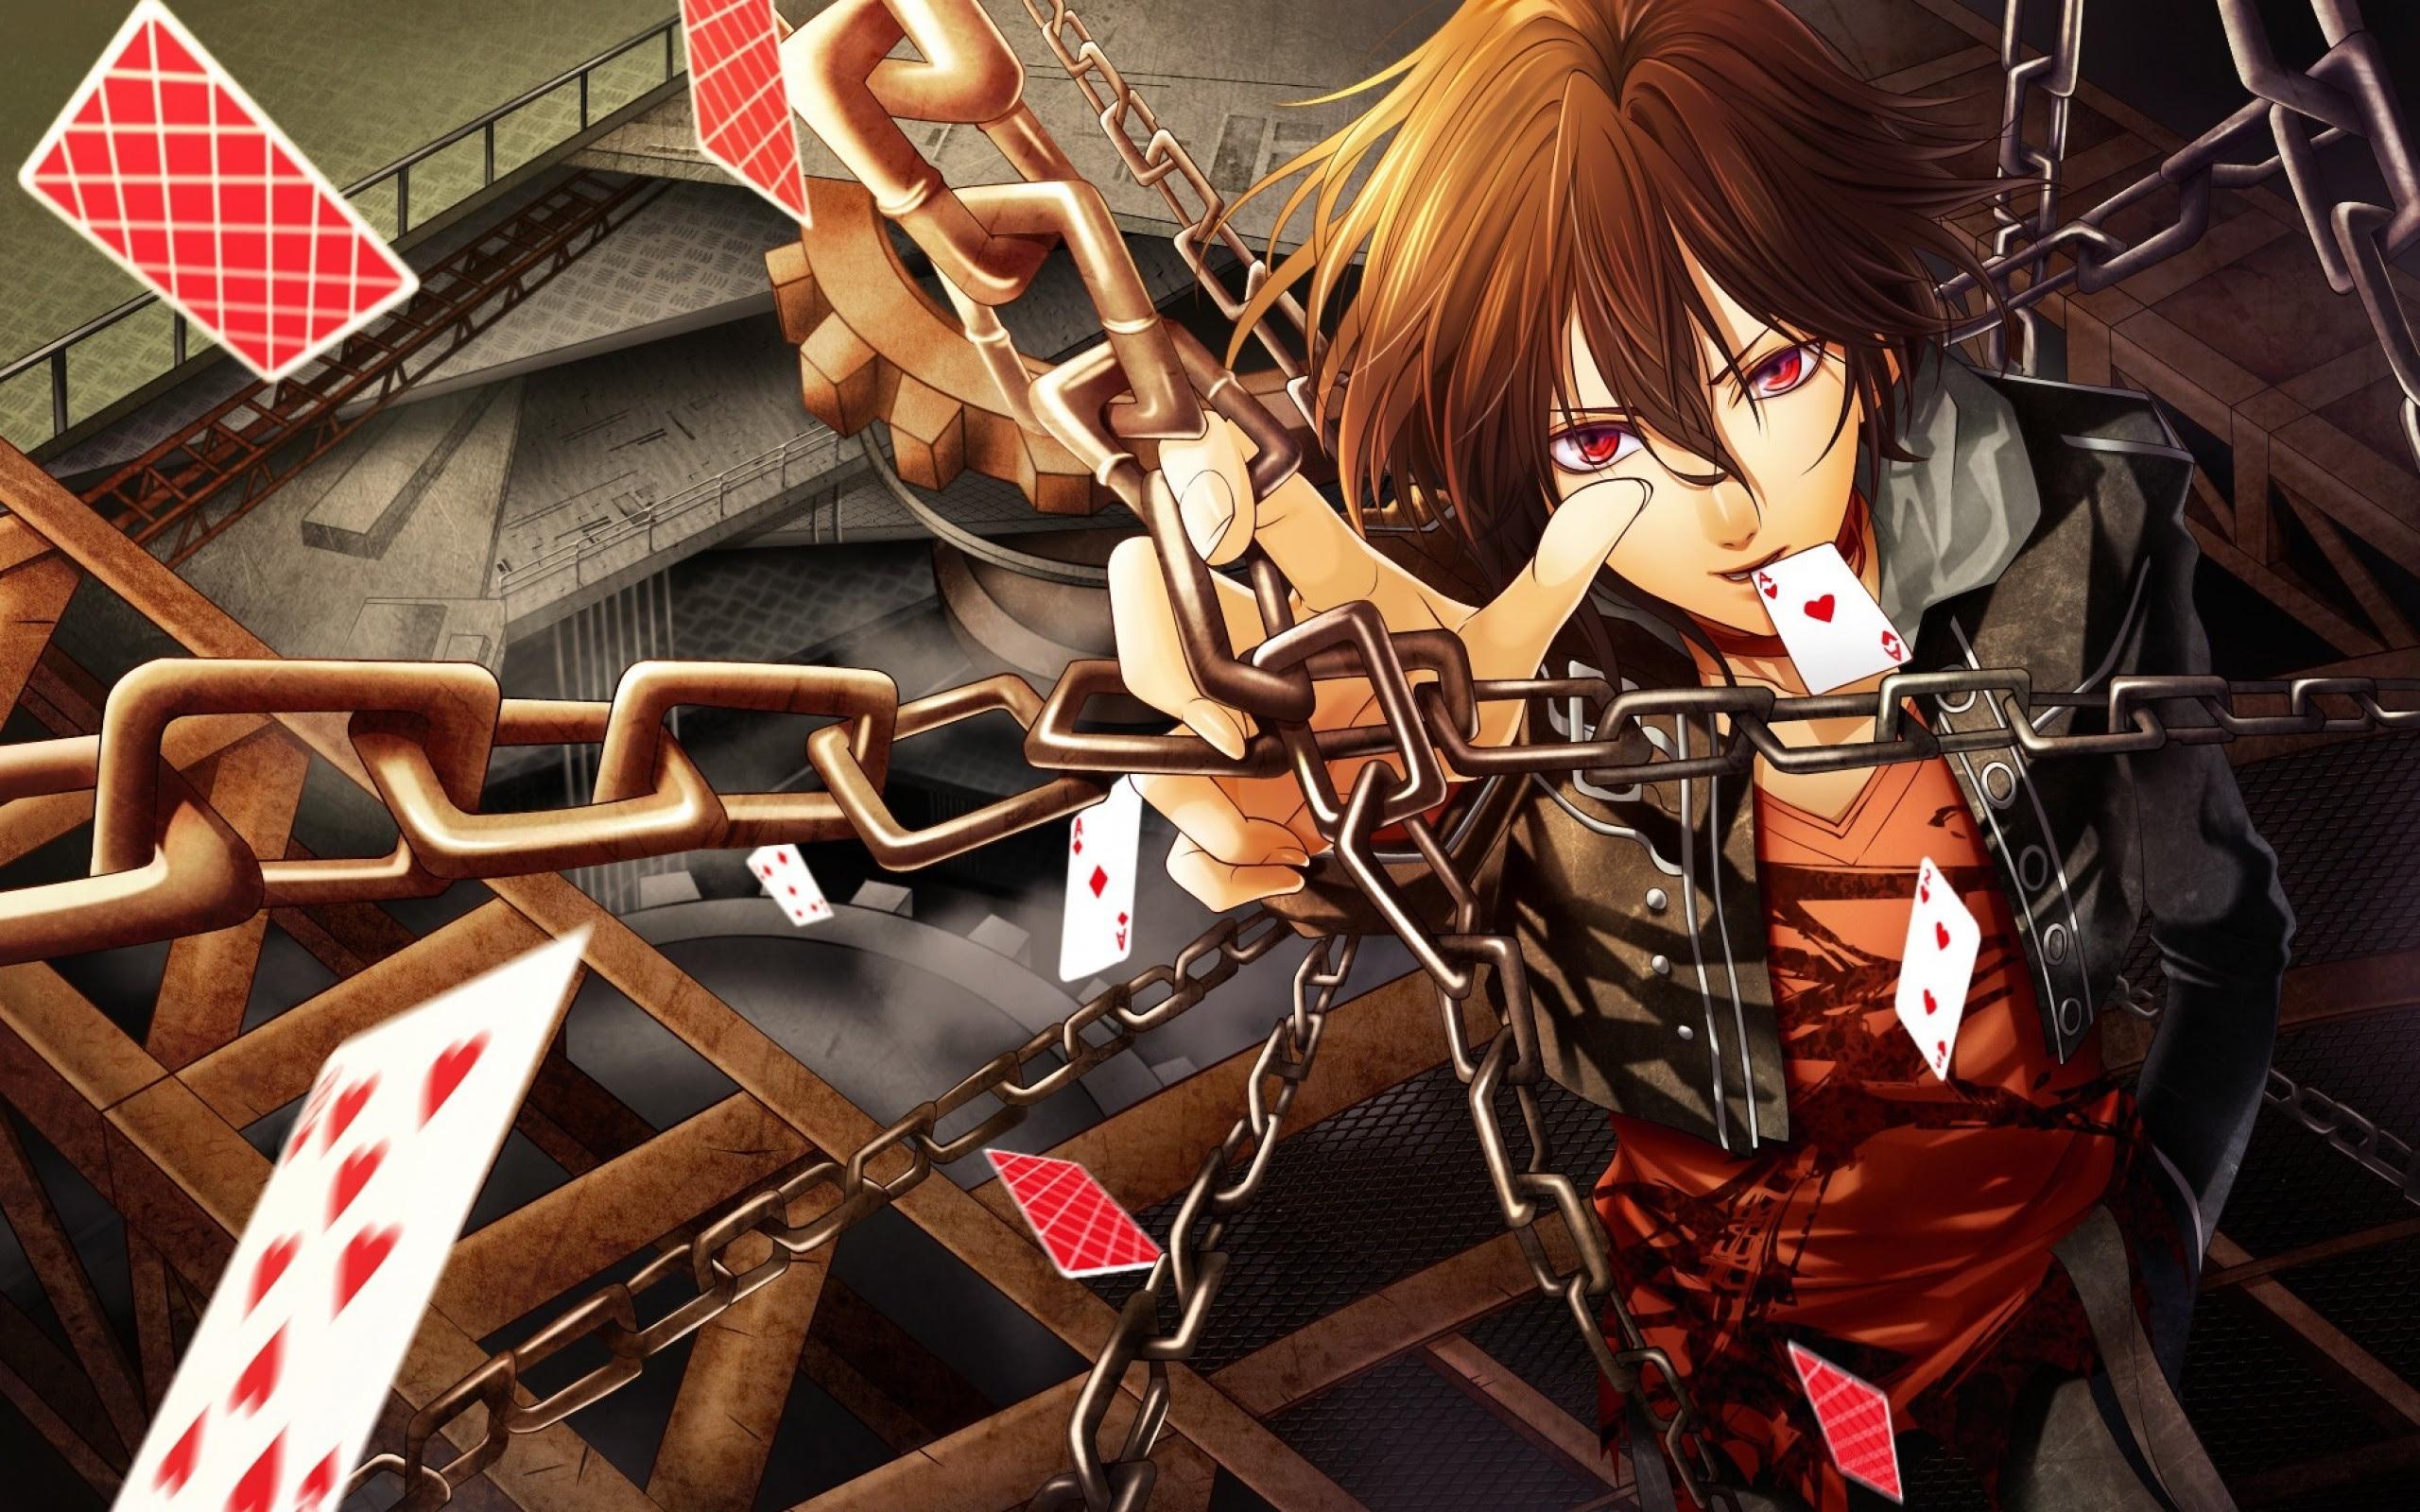 Unduh 200 Wallpaper Anime Hd Quality